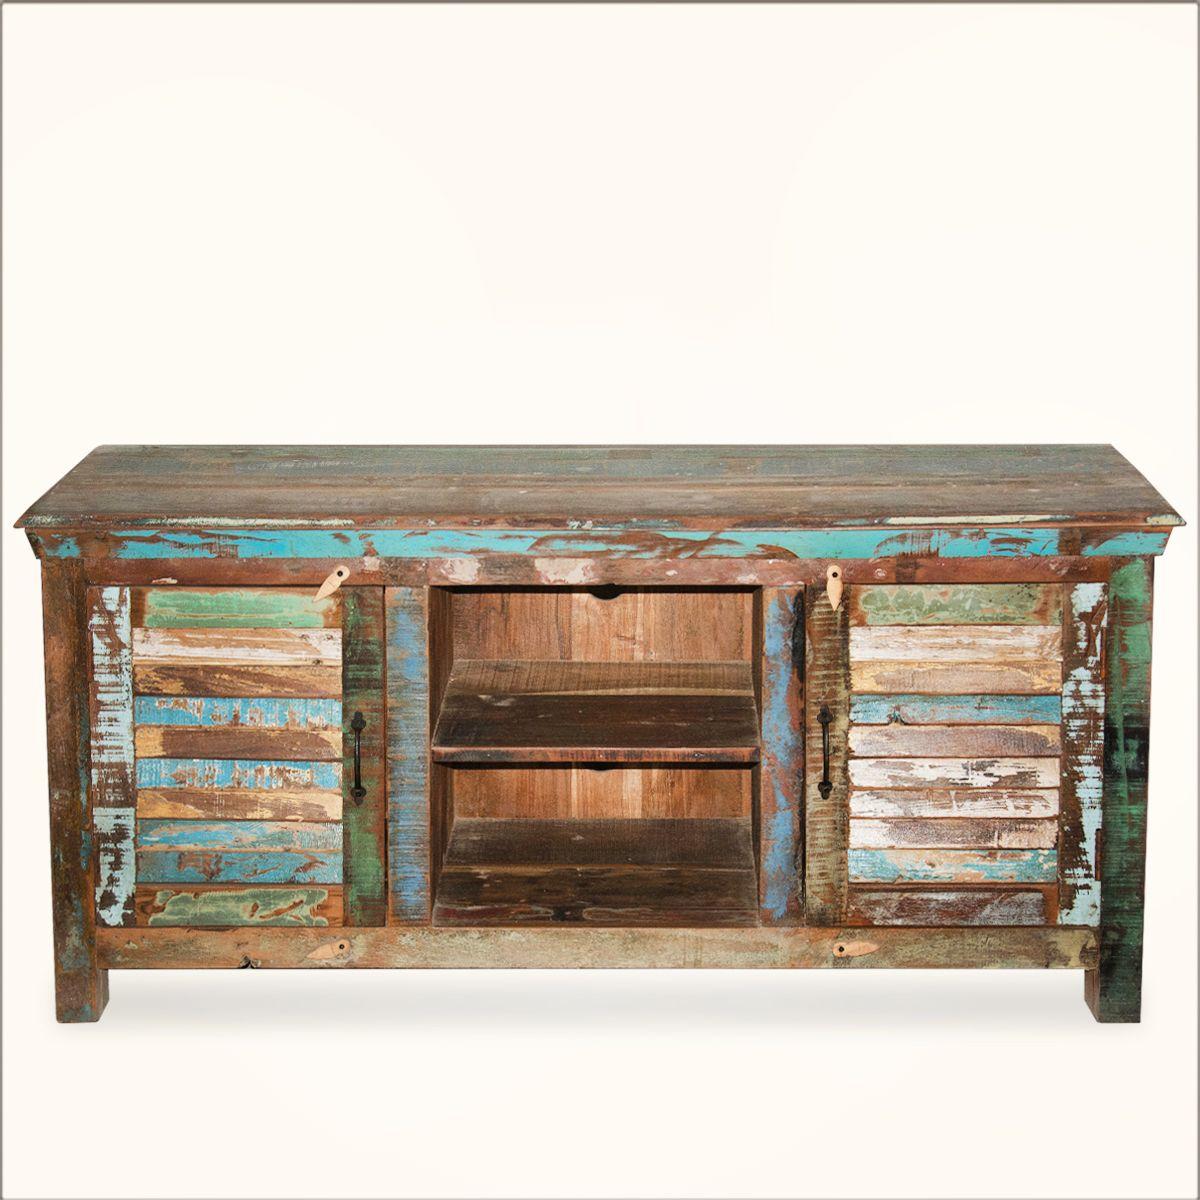 Alachian Rustic Shutter Doors Reclaimed Wood Tv Stand